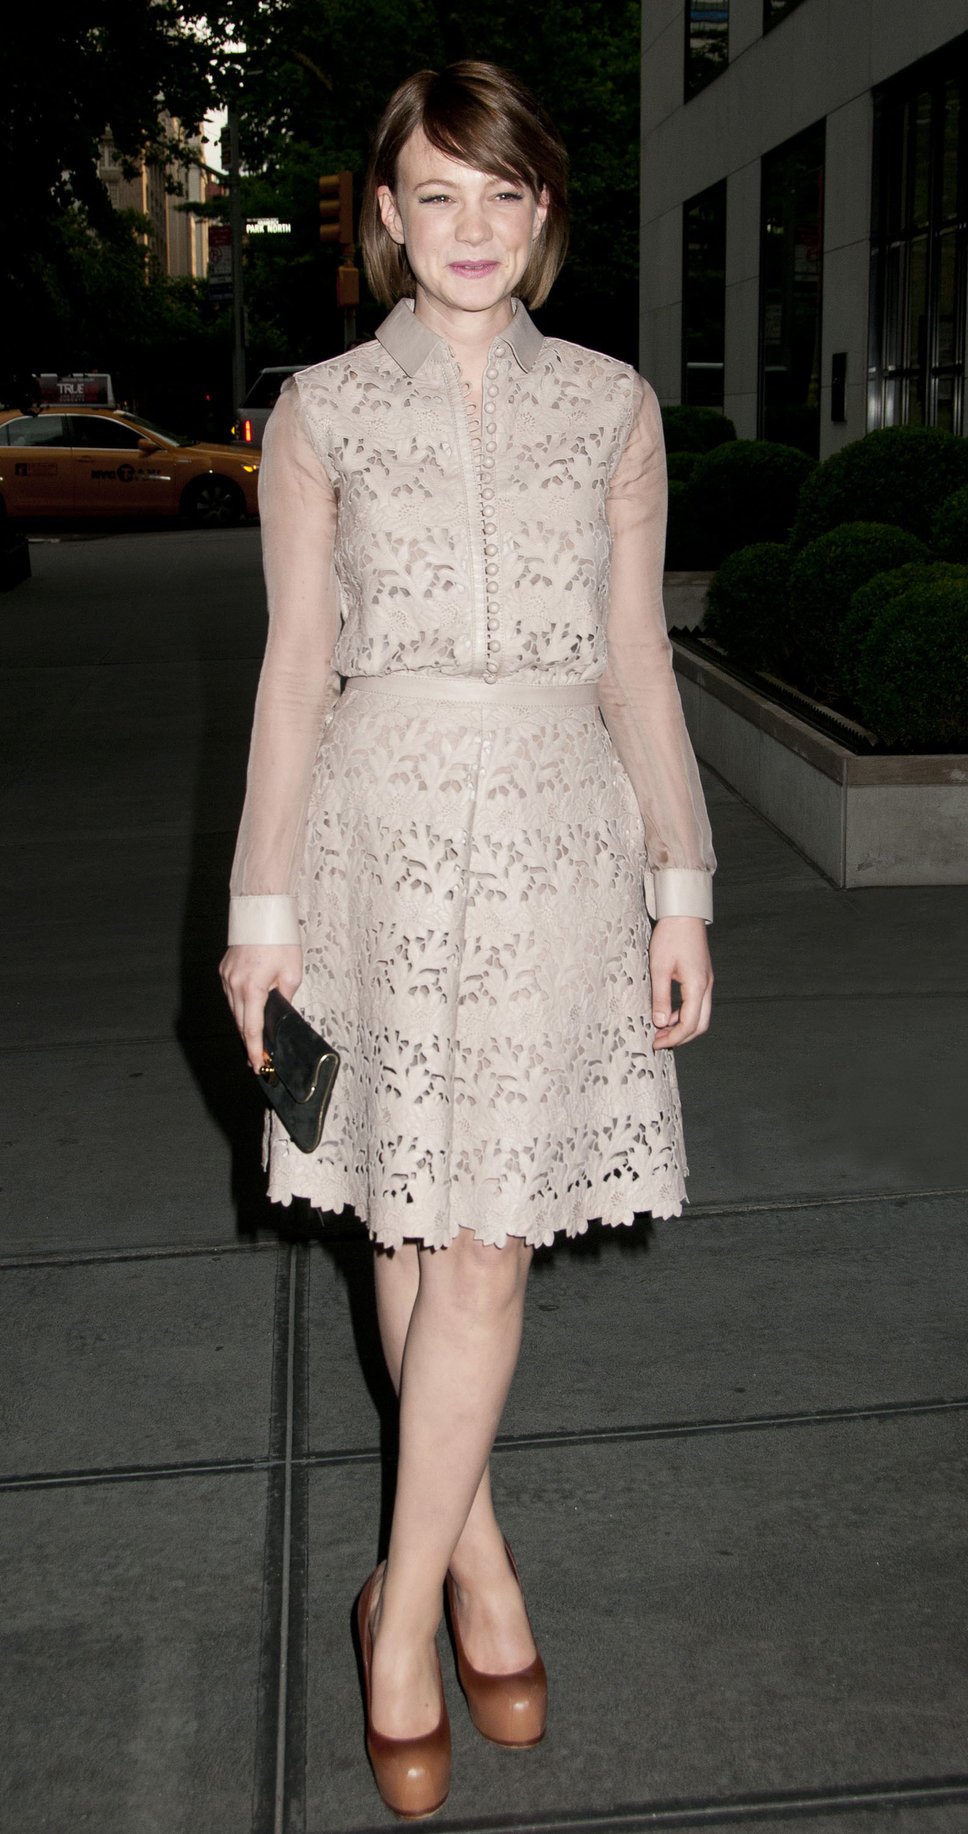 La mejor vestida de la semana Carey Mulligan | Estarguapas